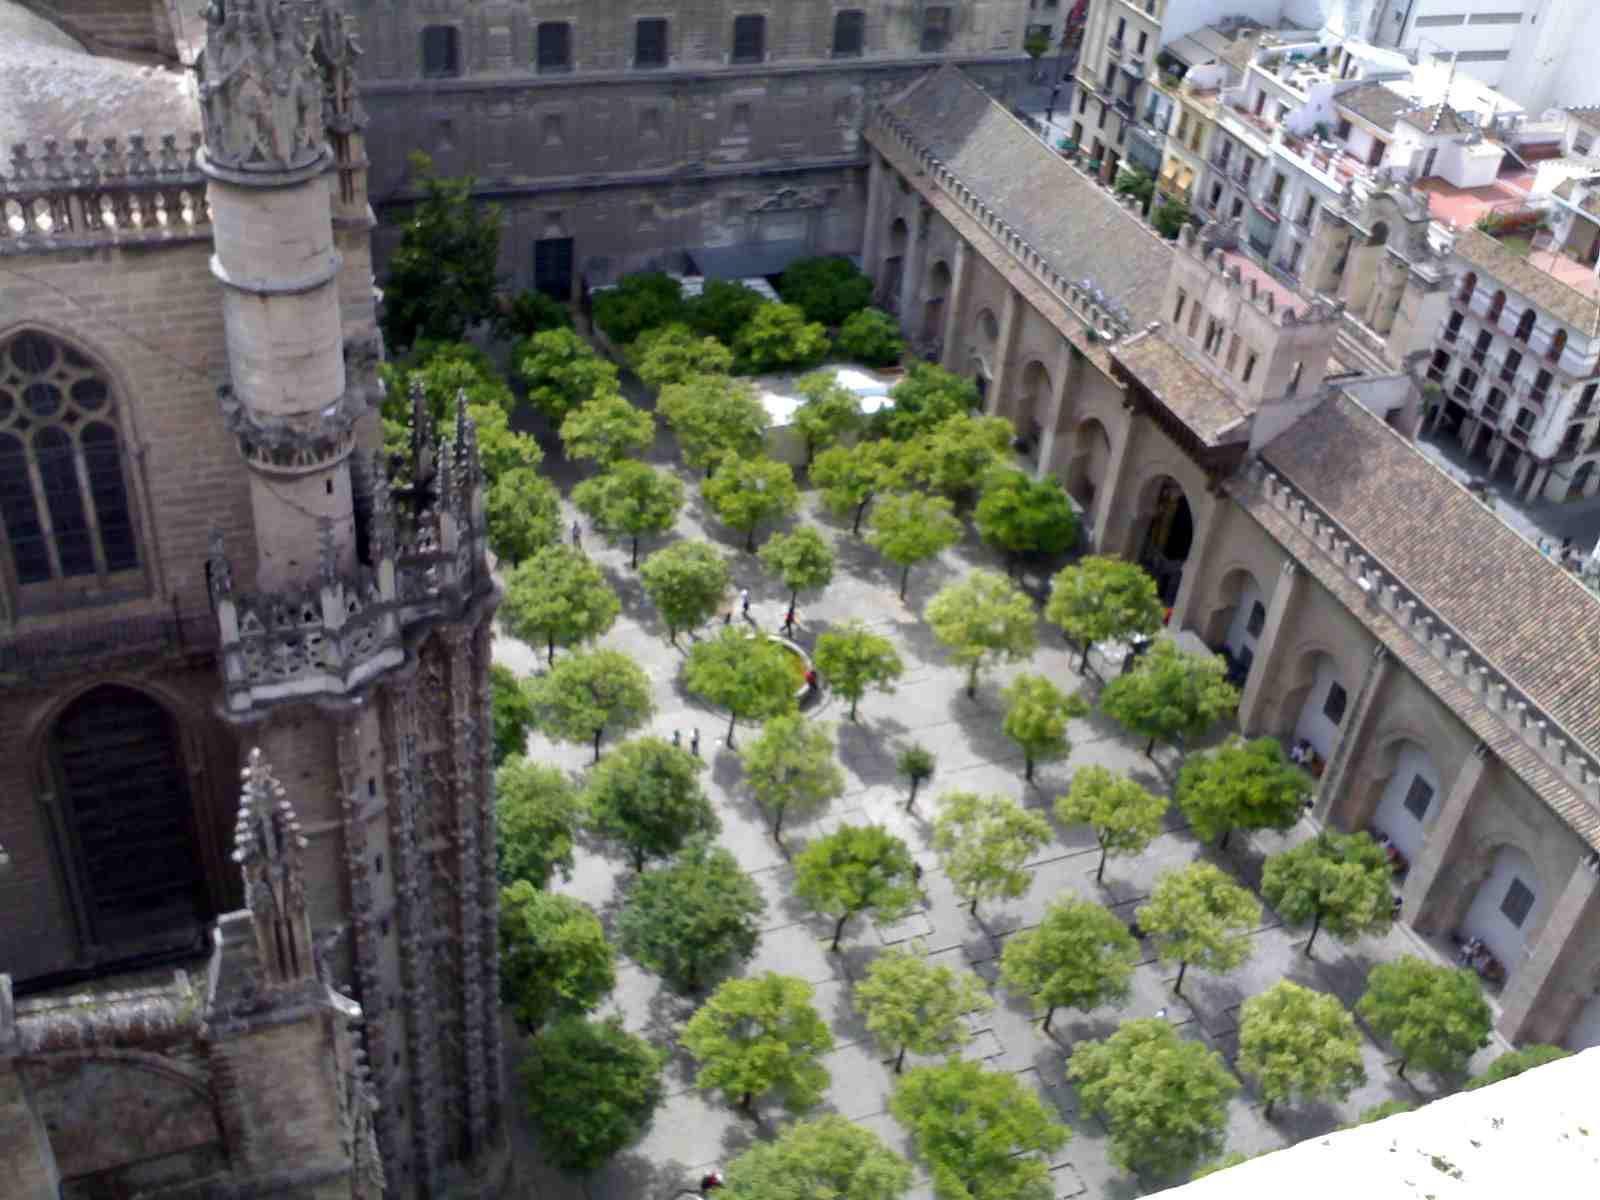 Catedral de Sevilla, siglo XV. el